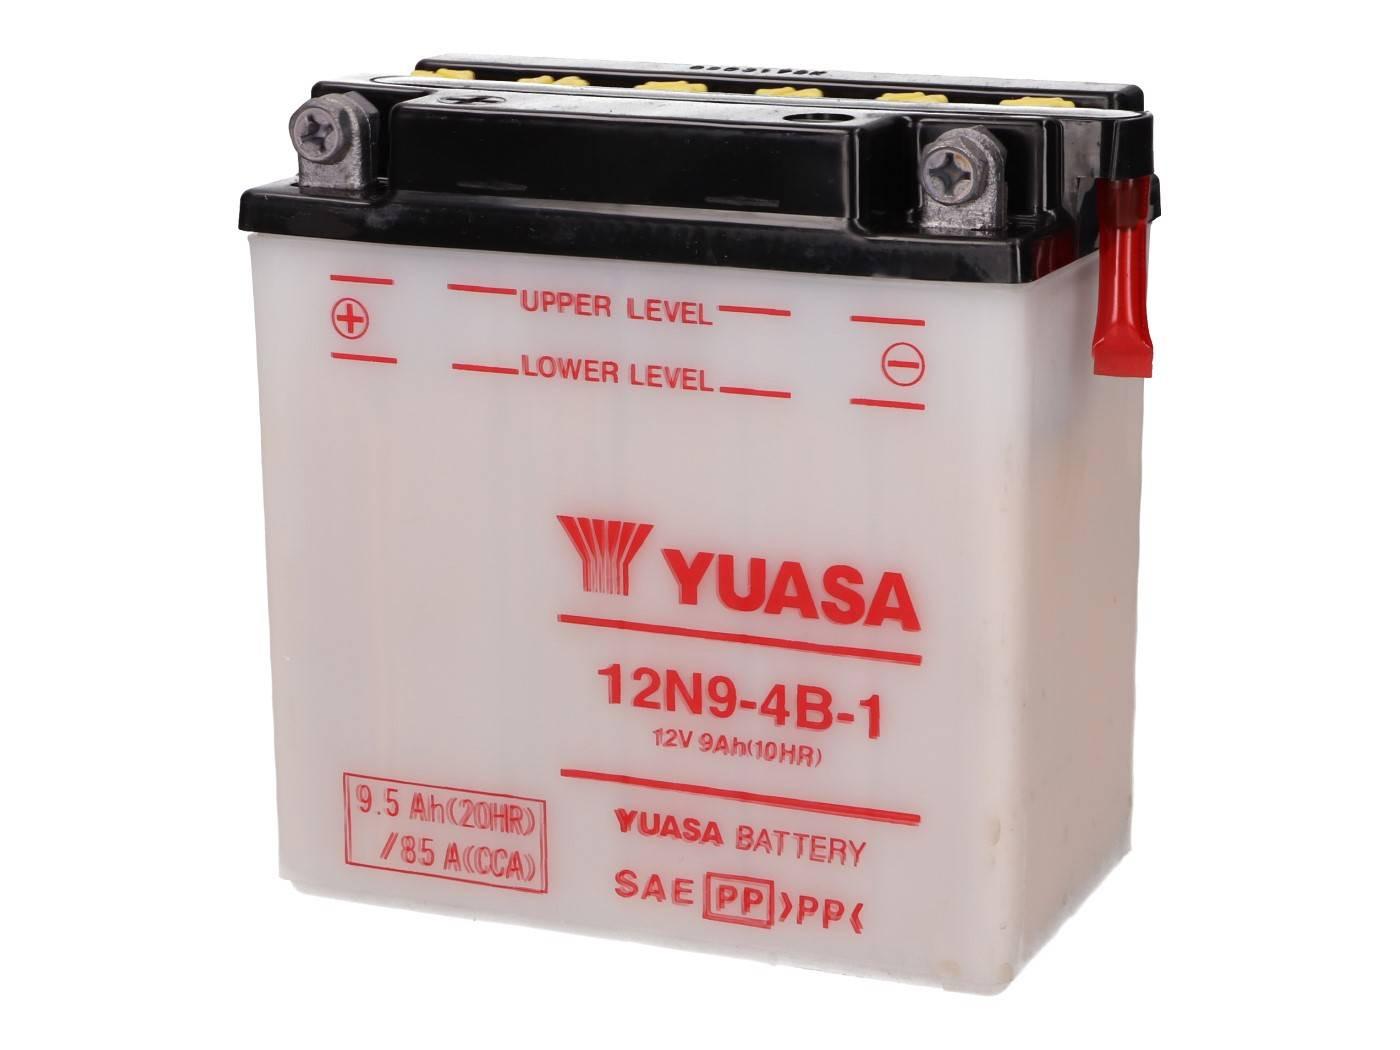 Yuasa 12N9-4B-1 akkumulátor - savcsomag nélkül